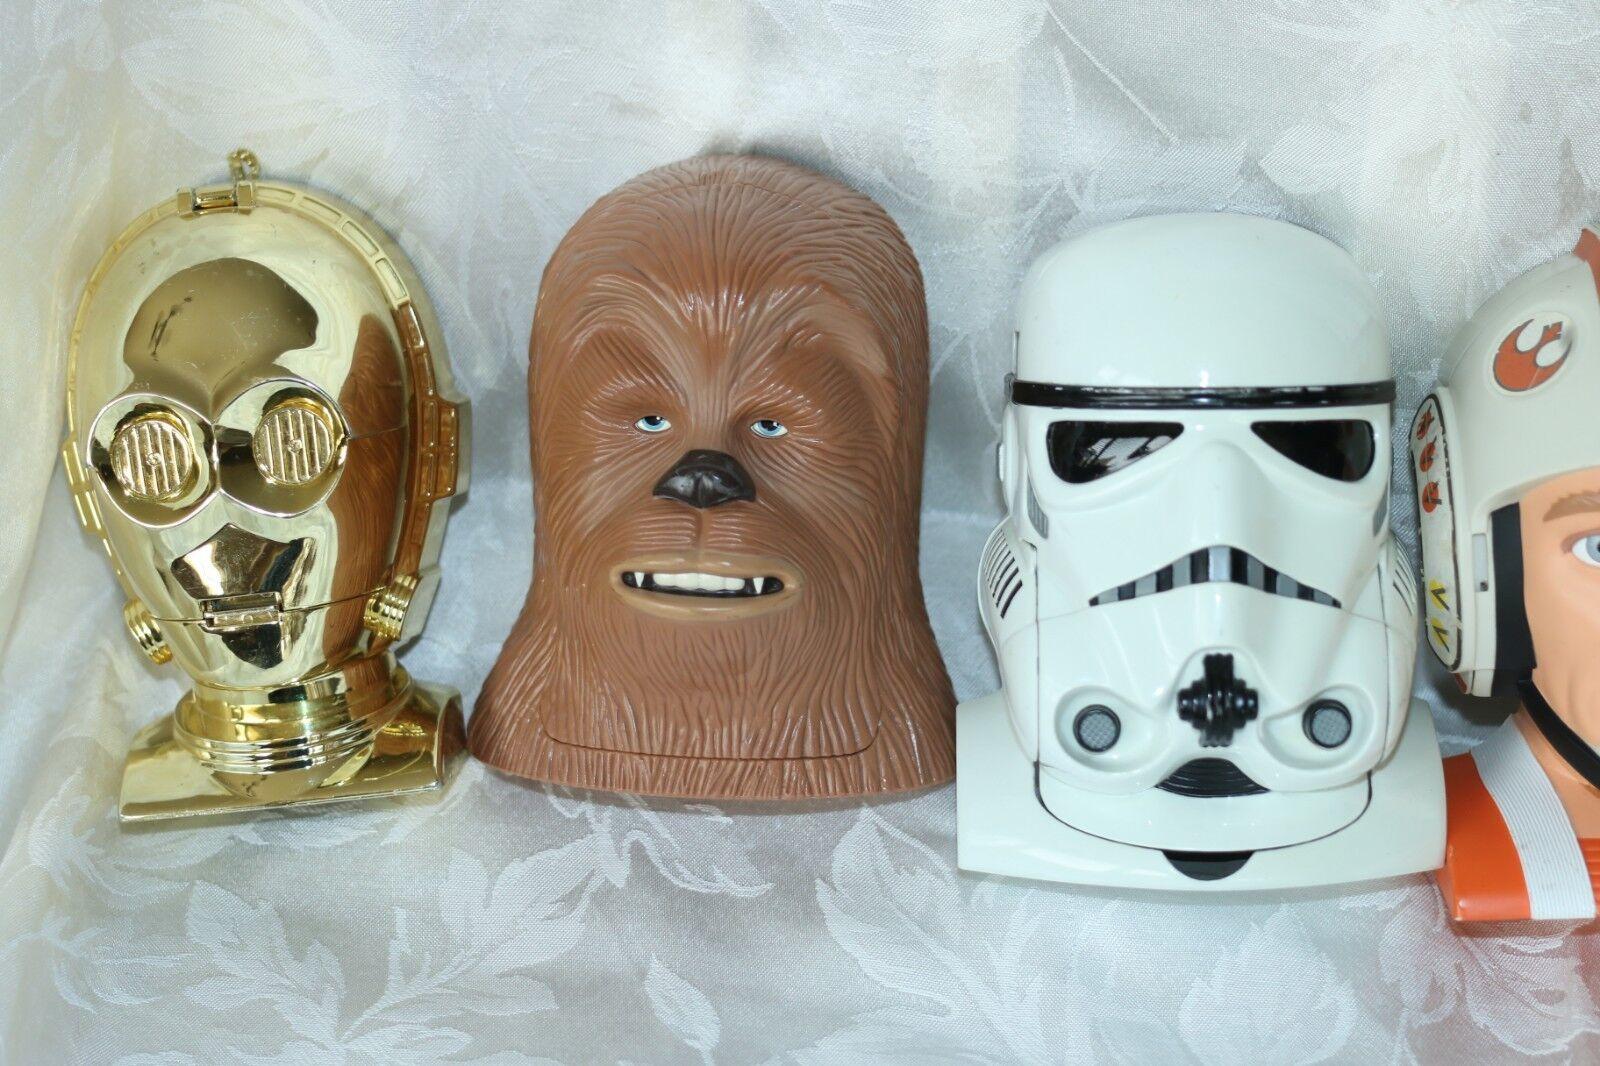 Lot Lot Lot of 6 Star Wars Galoob Toys 1994-1996 Transforming Heads Luke R2D2 3CPO Darth 737f41